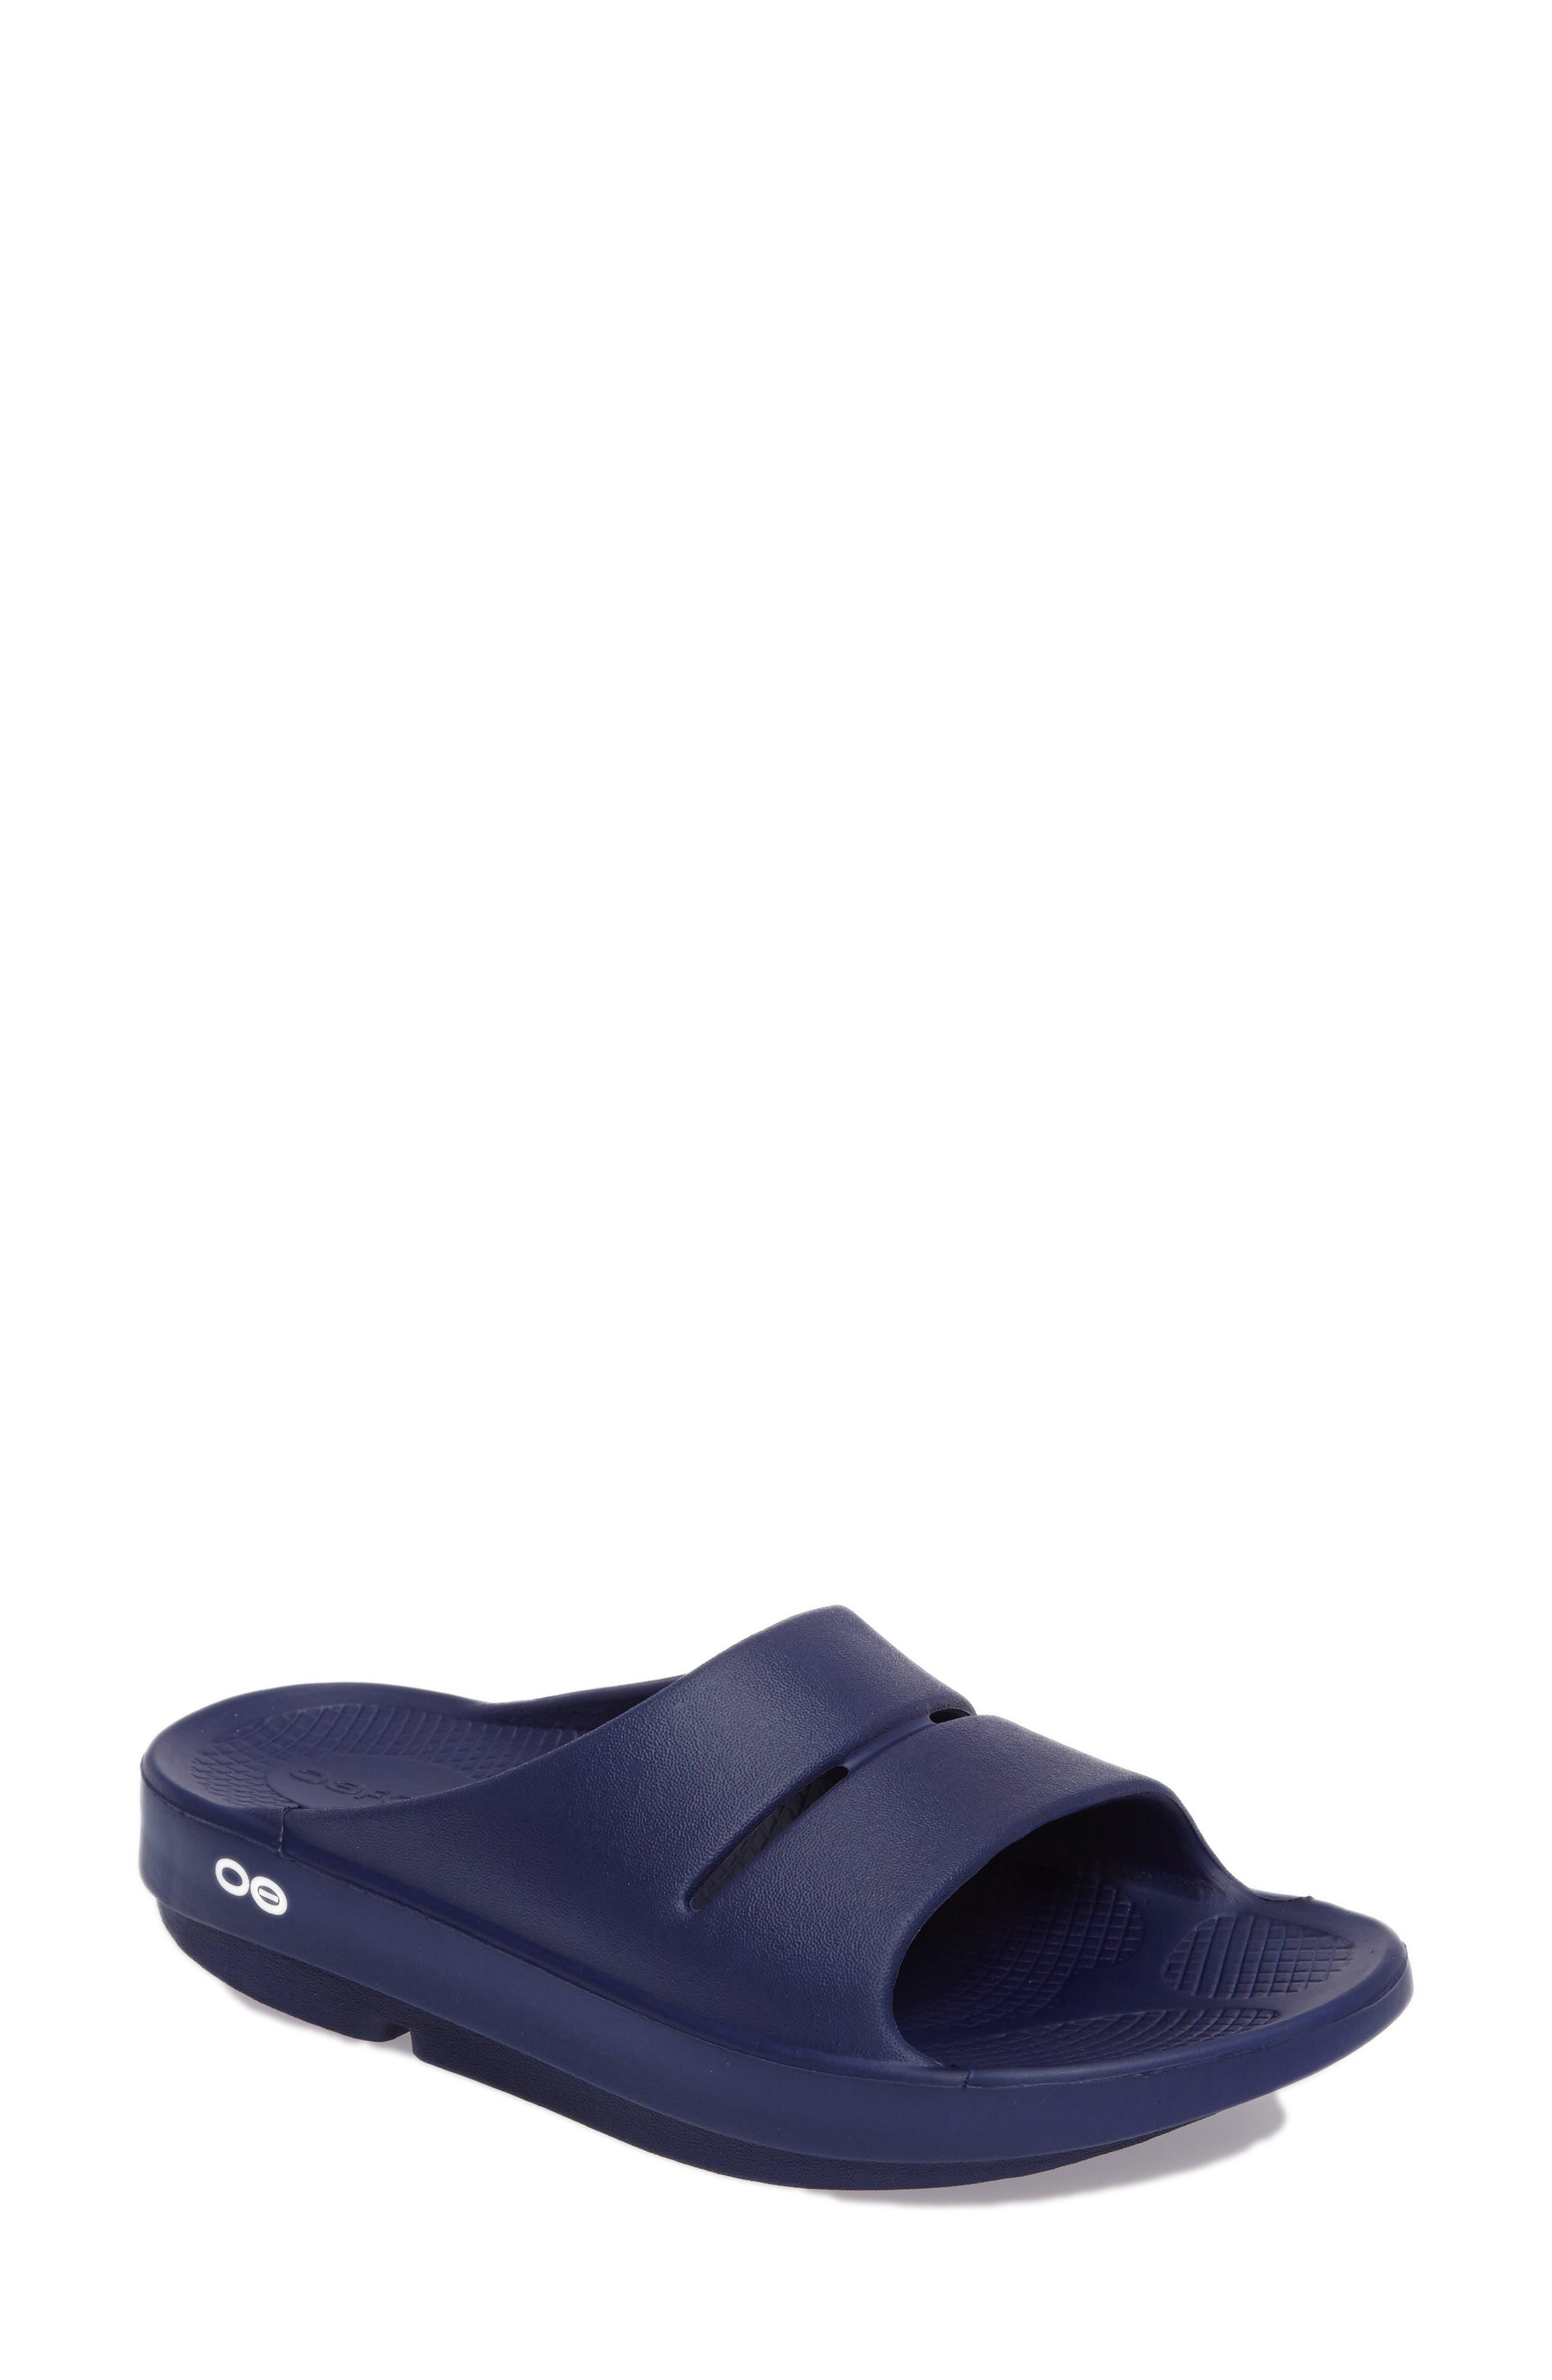 Alternate Image 1 Selected - Oofos OOahh Slide Sandal (Women)